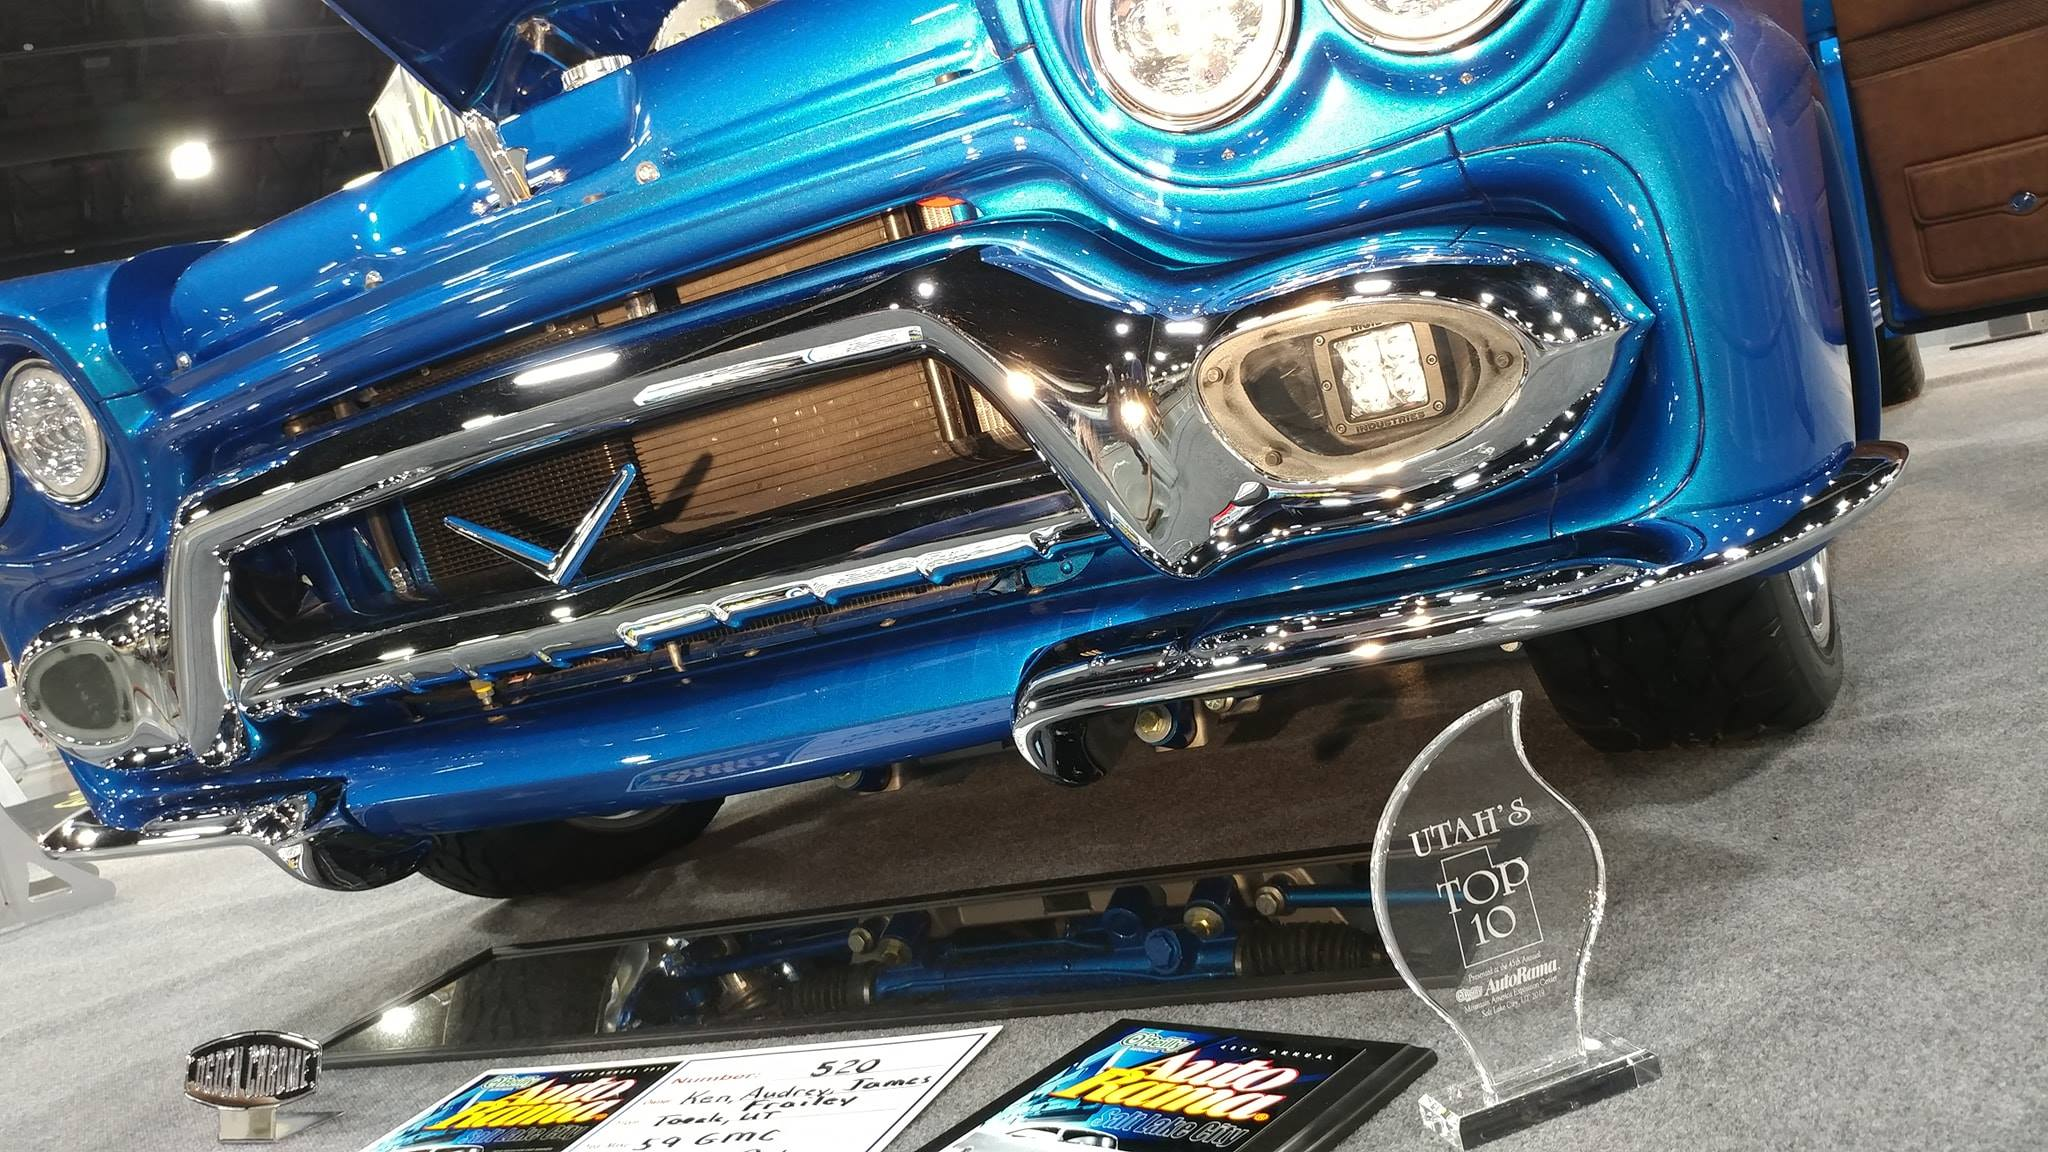 1959-gmc-front-end-top10-award.jpg